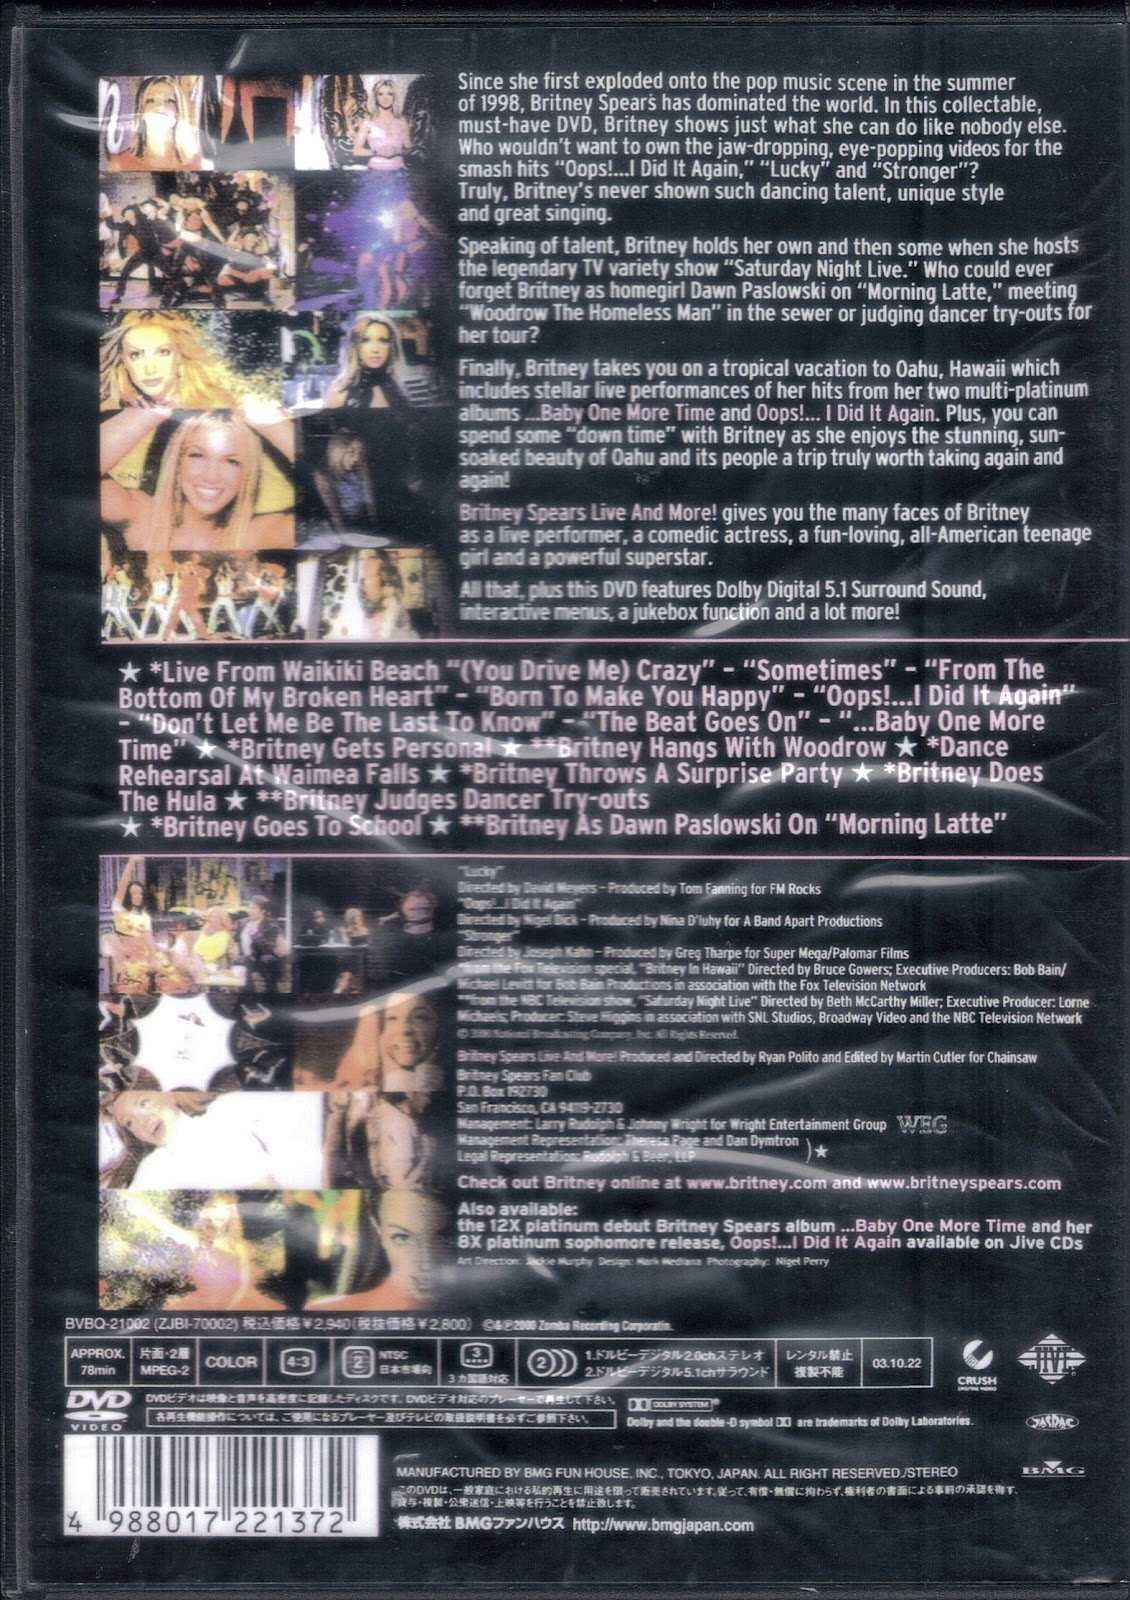 http://2.bp.blogspot.com/-Sgv8crVgdjM/T23830Ky3uI/AAAAAAAAAJ4/EV-pKK9olo8/s1600/Back+Cover.jpg